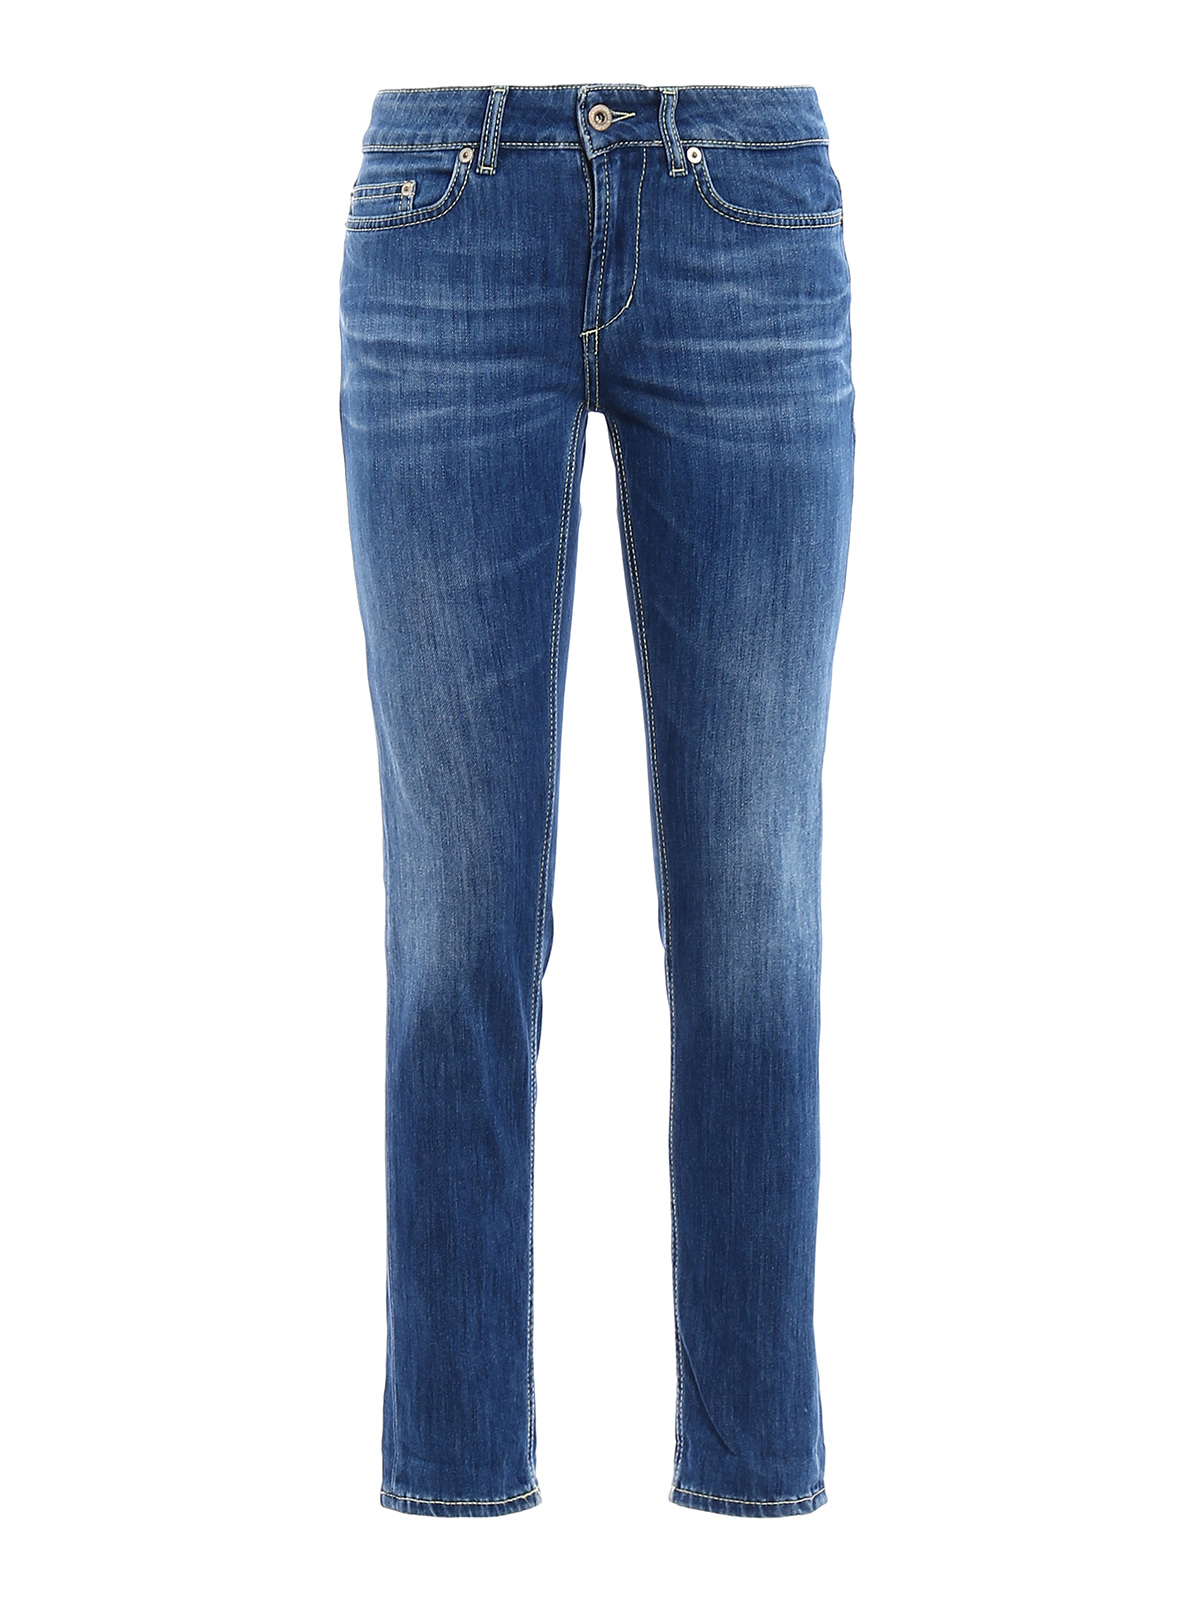 monroe low waist skinny jeans by dondup skinny jeans shop online at p692 ds107d. Black Bedroom Furniture Sets. Home Design Ideas